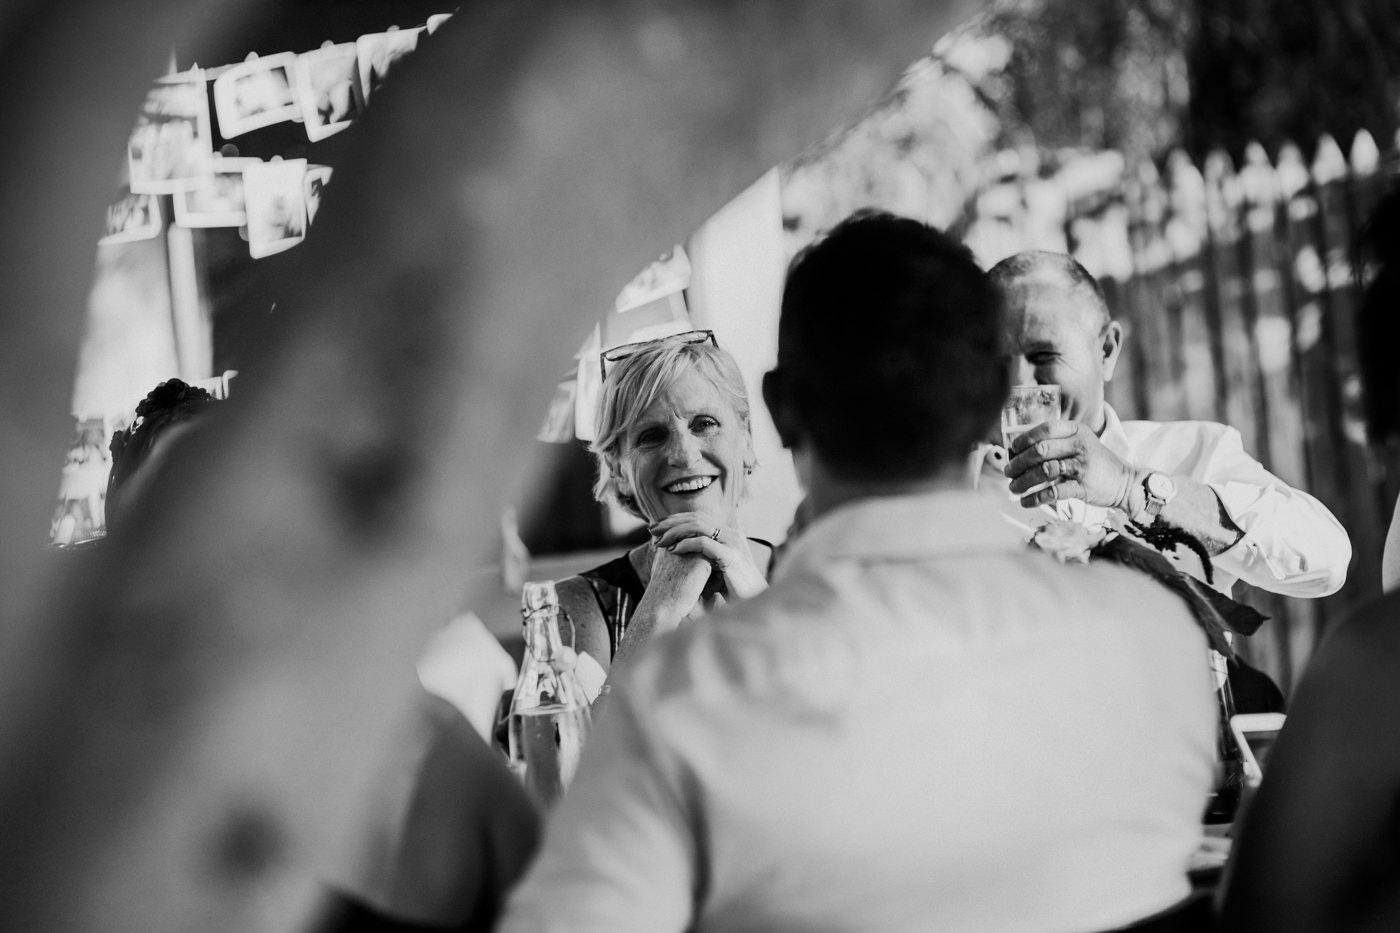 Anthony & Eliet - Wagga Wagga Wedding - Country NSW - Samantha Heather Photography-131.jpg